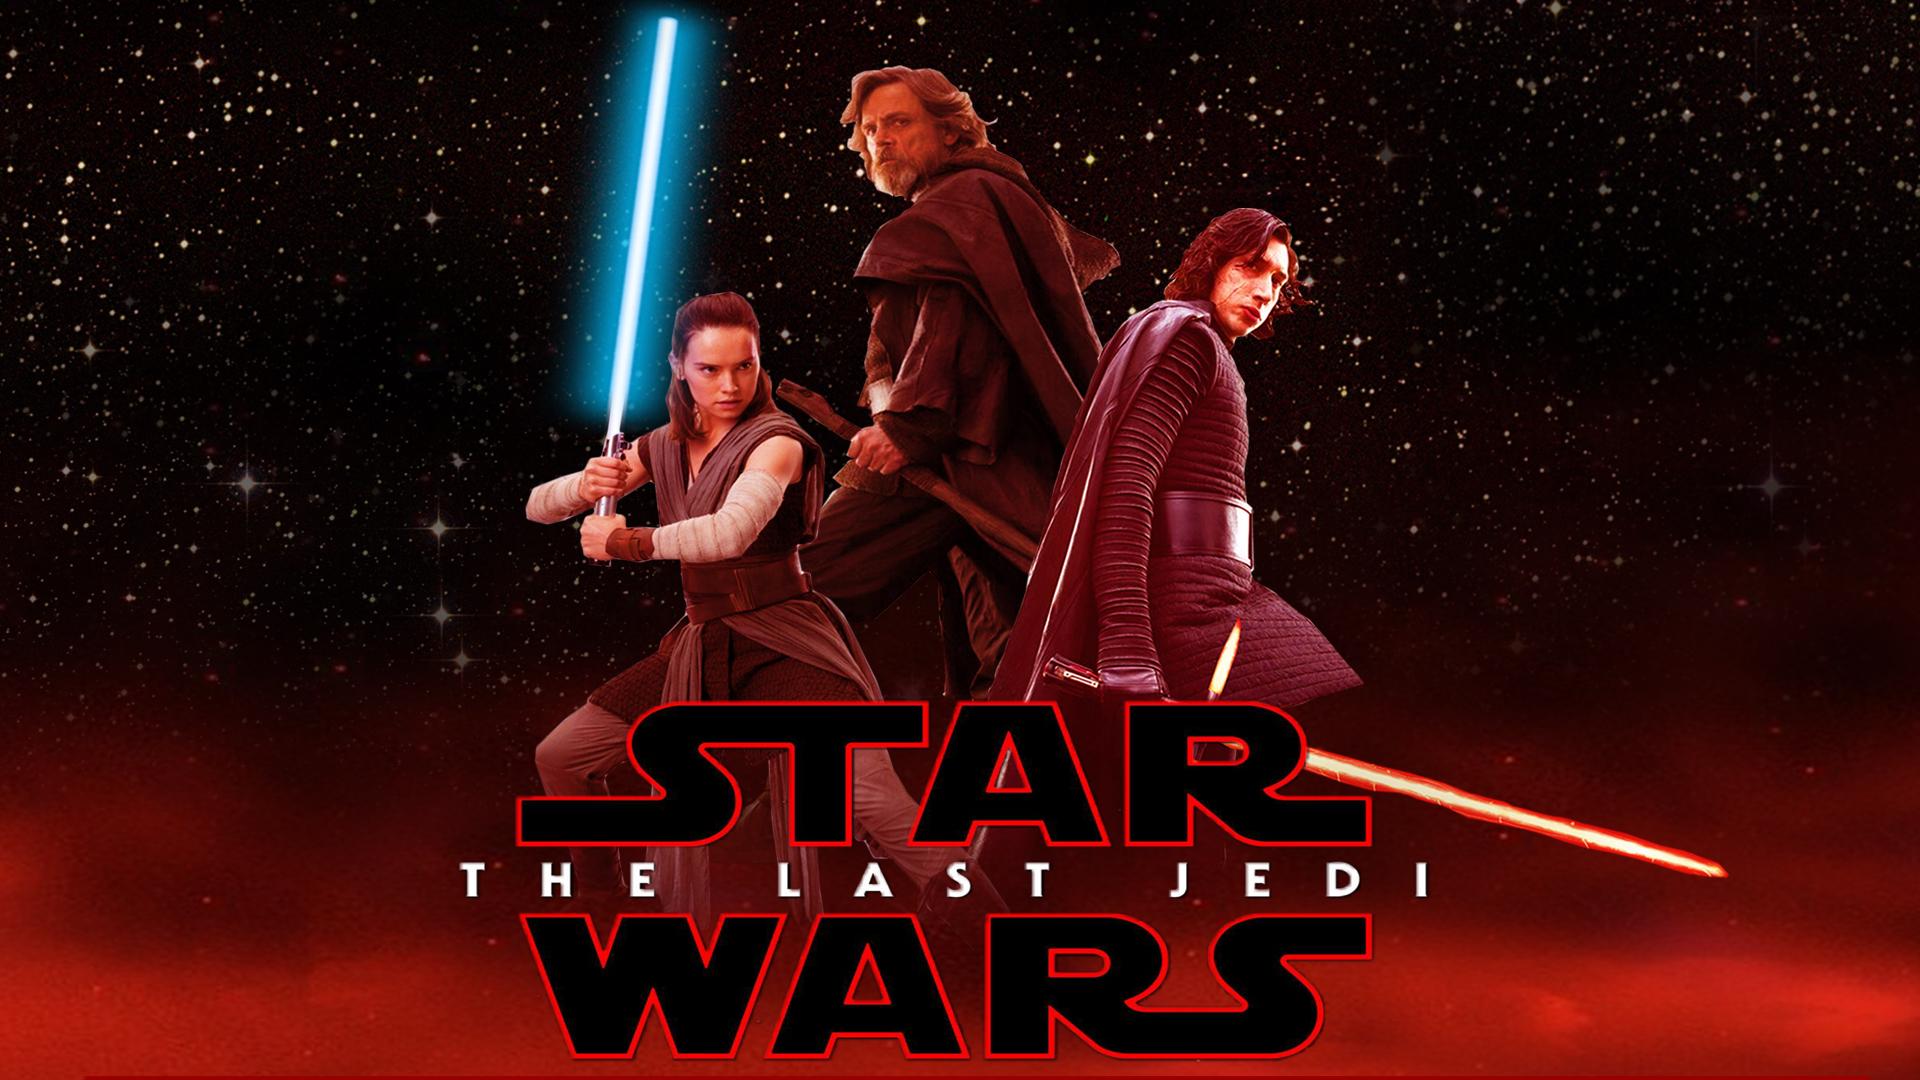 The Last Jedi Desktop Wallpaper Posted By John Johnson